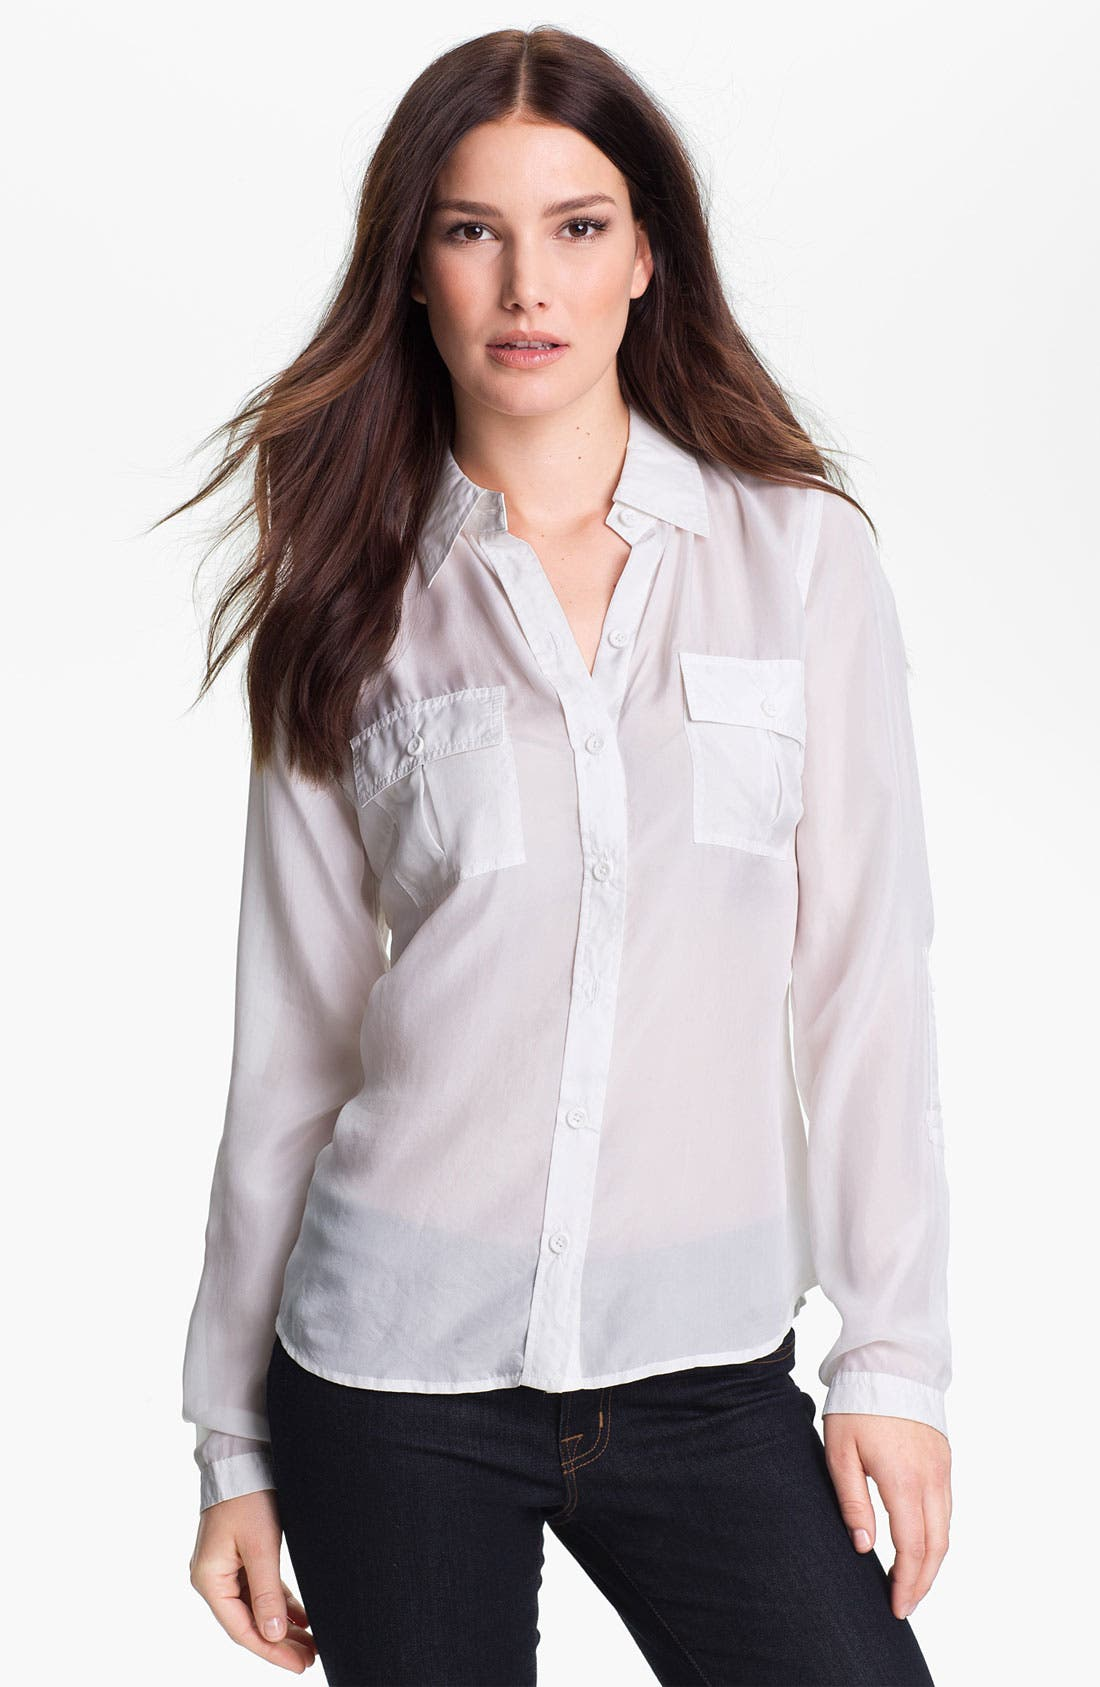 Alternate Image 1 Selected - Go by go Silk Safari Shirt